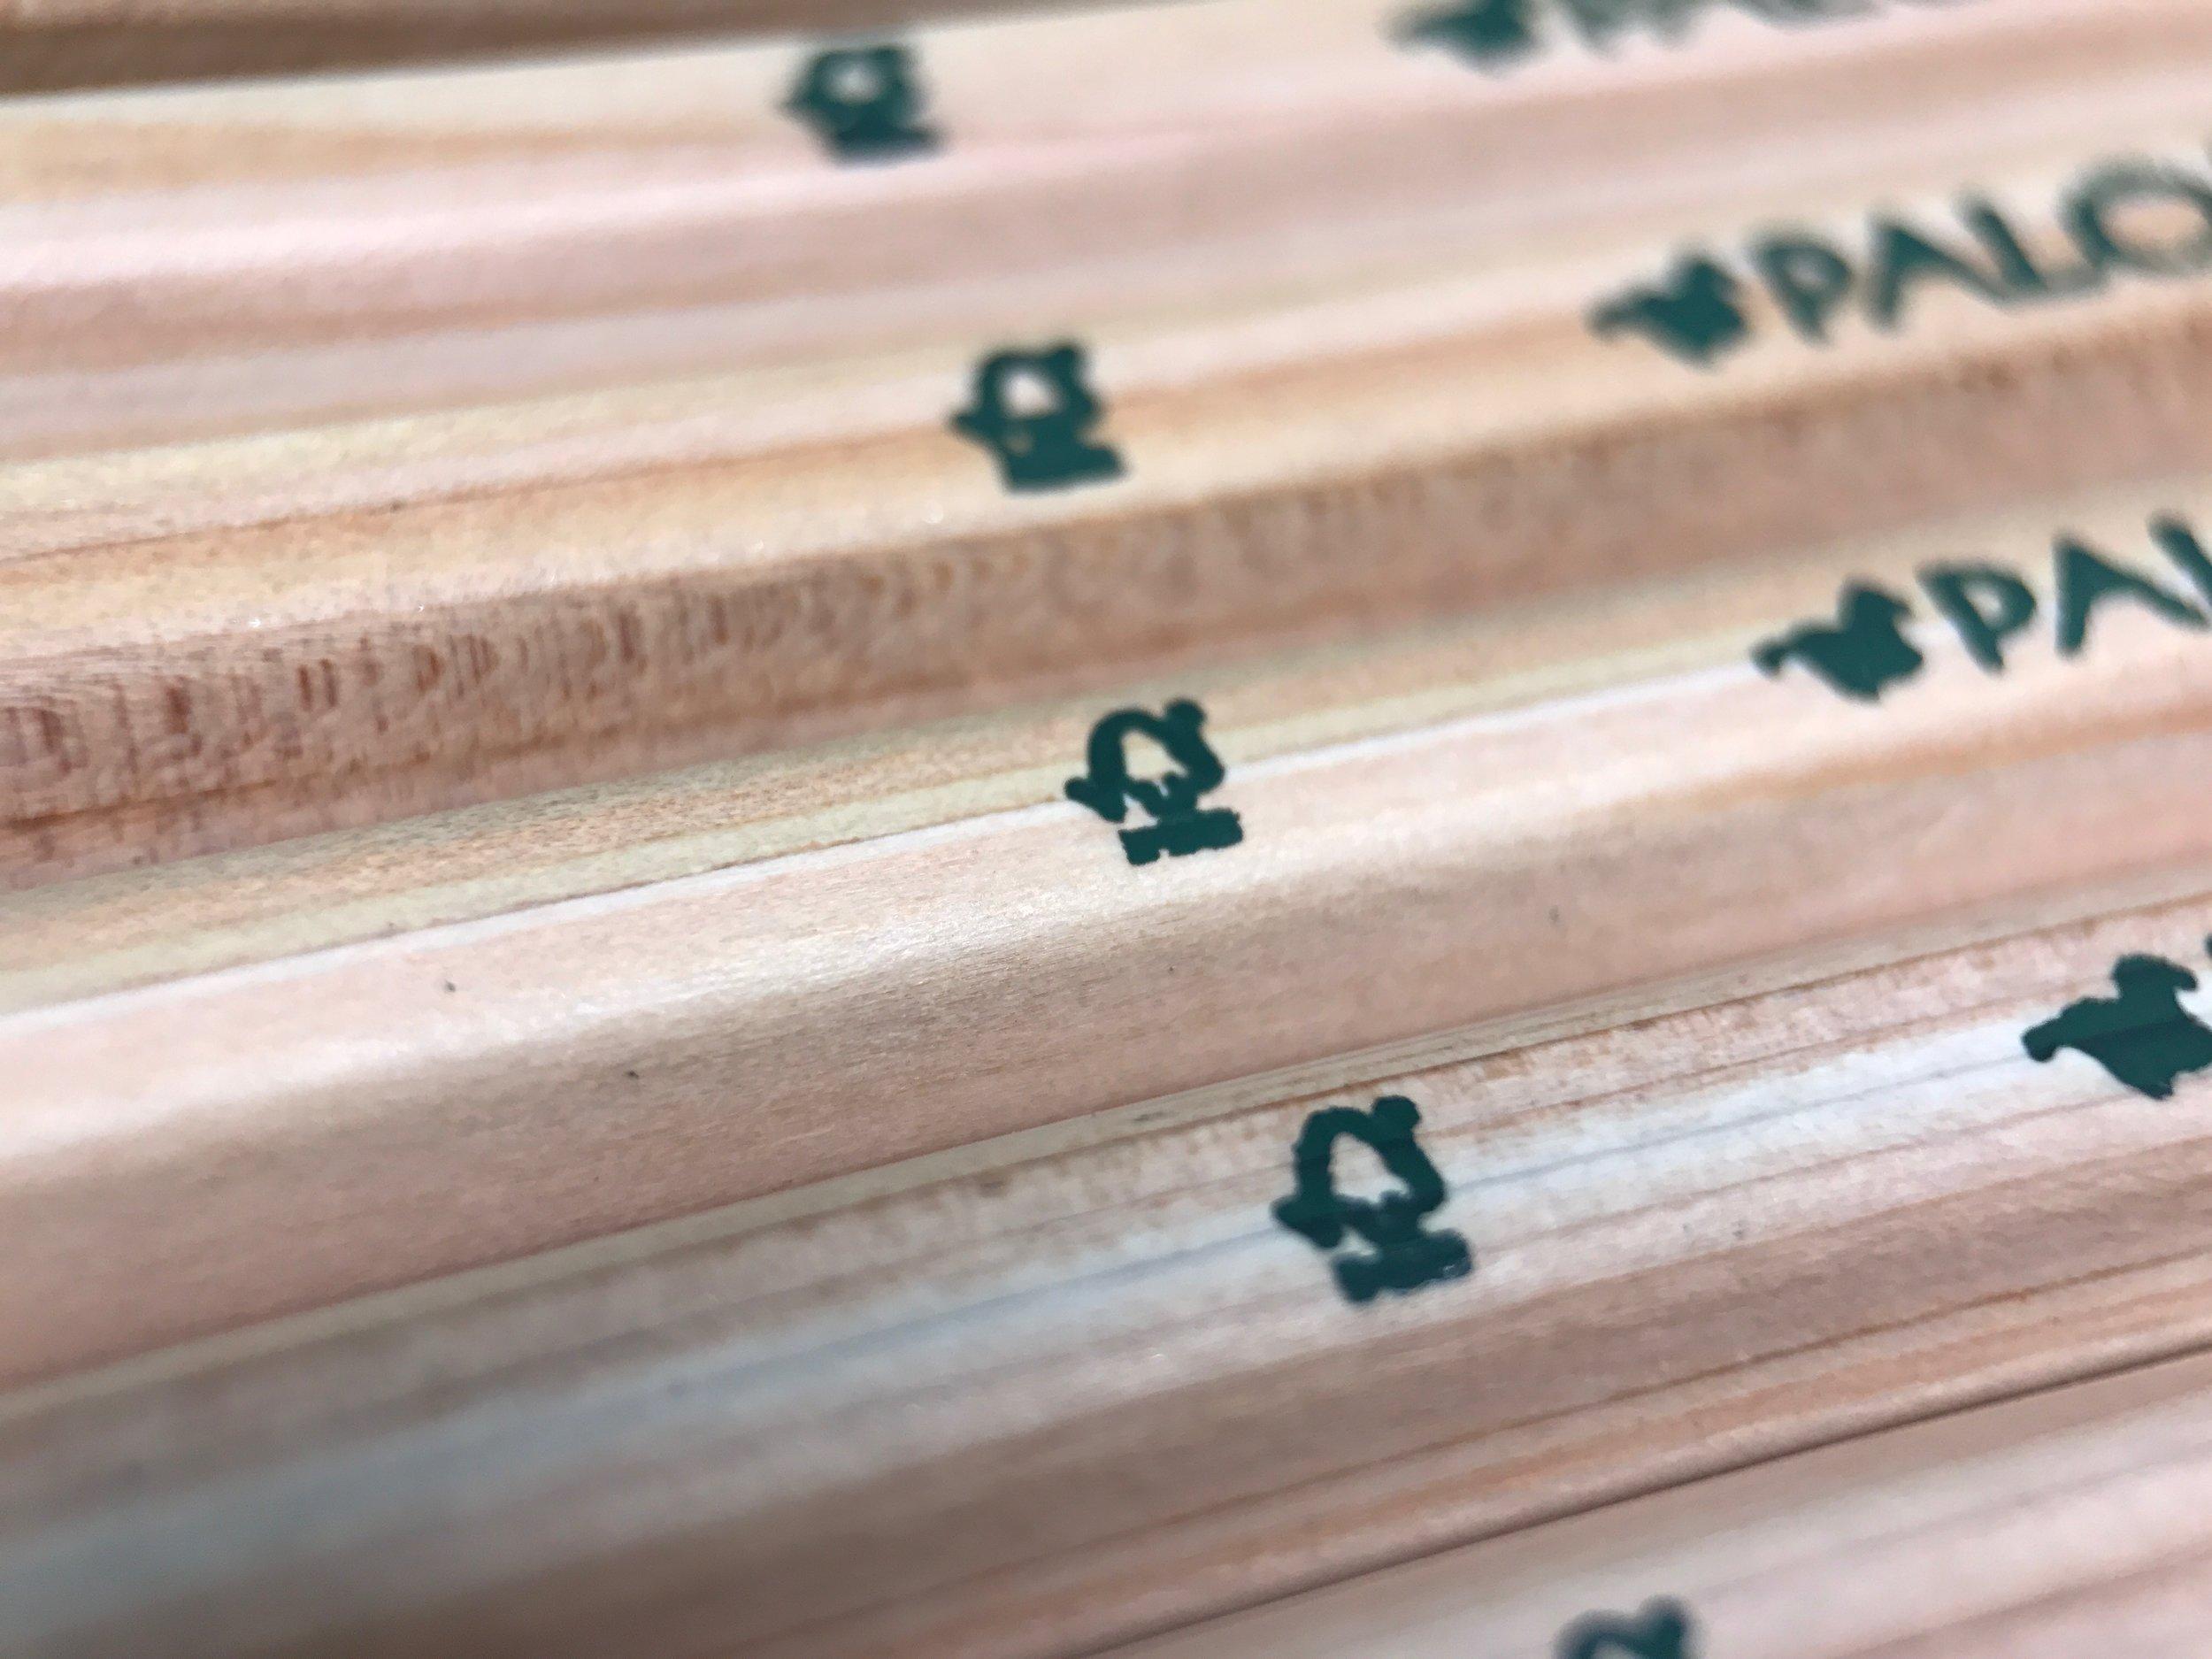 palomino-forest-choice-pencil-6.jpg